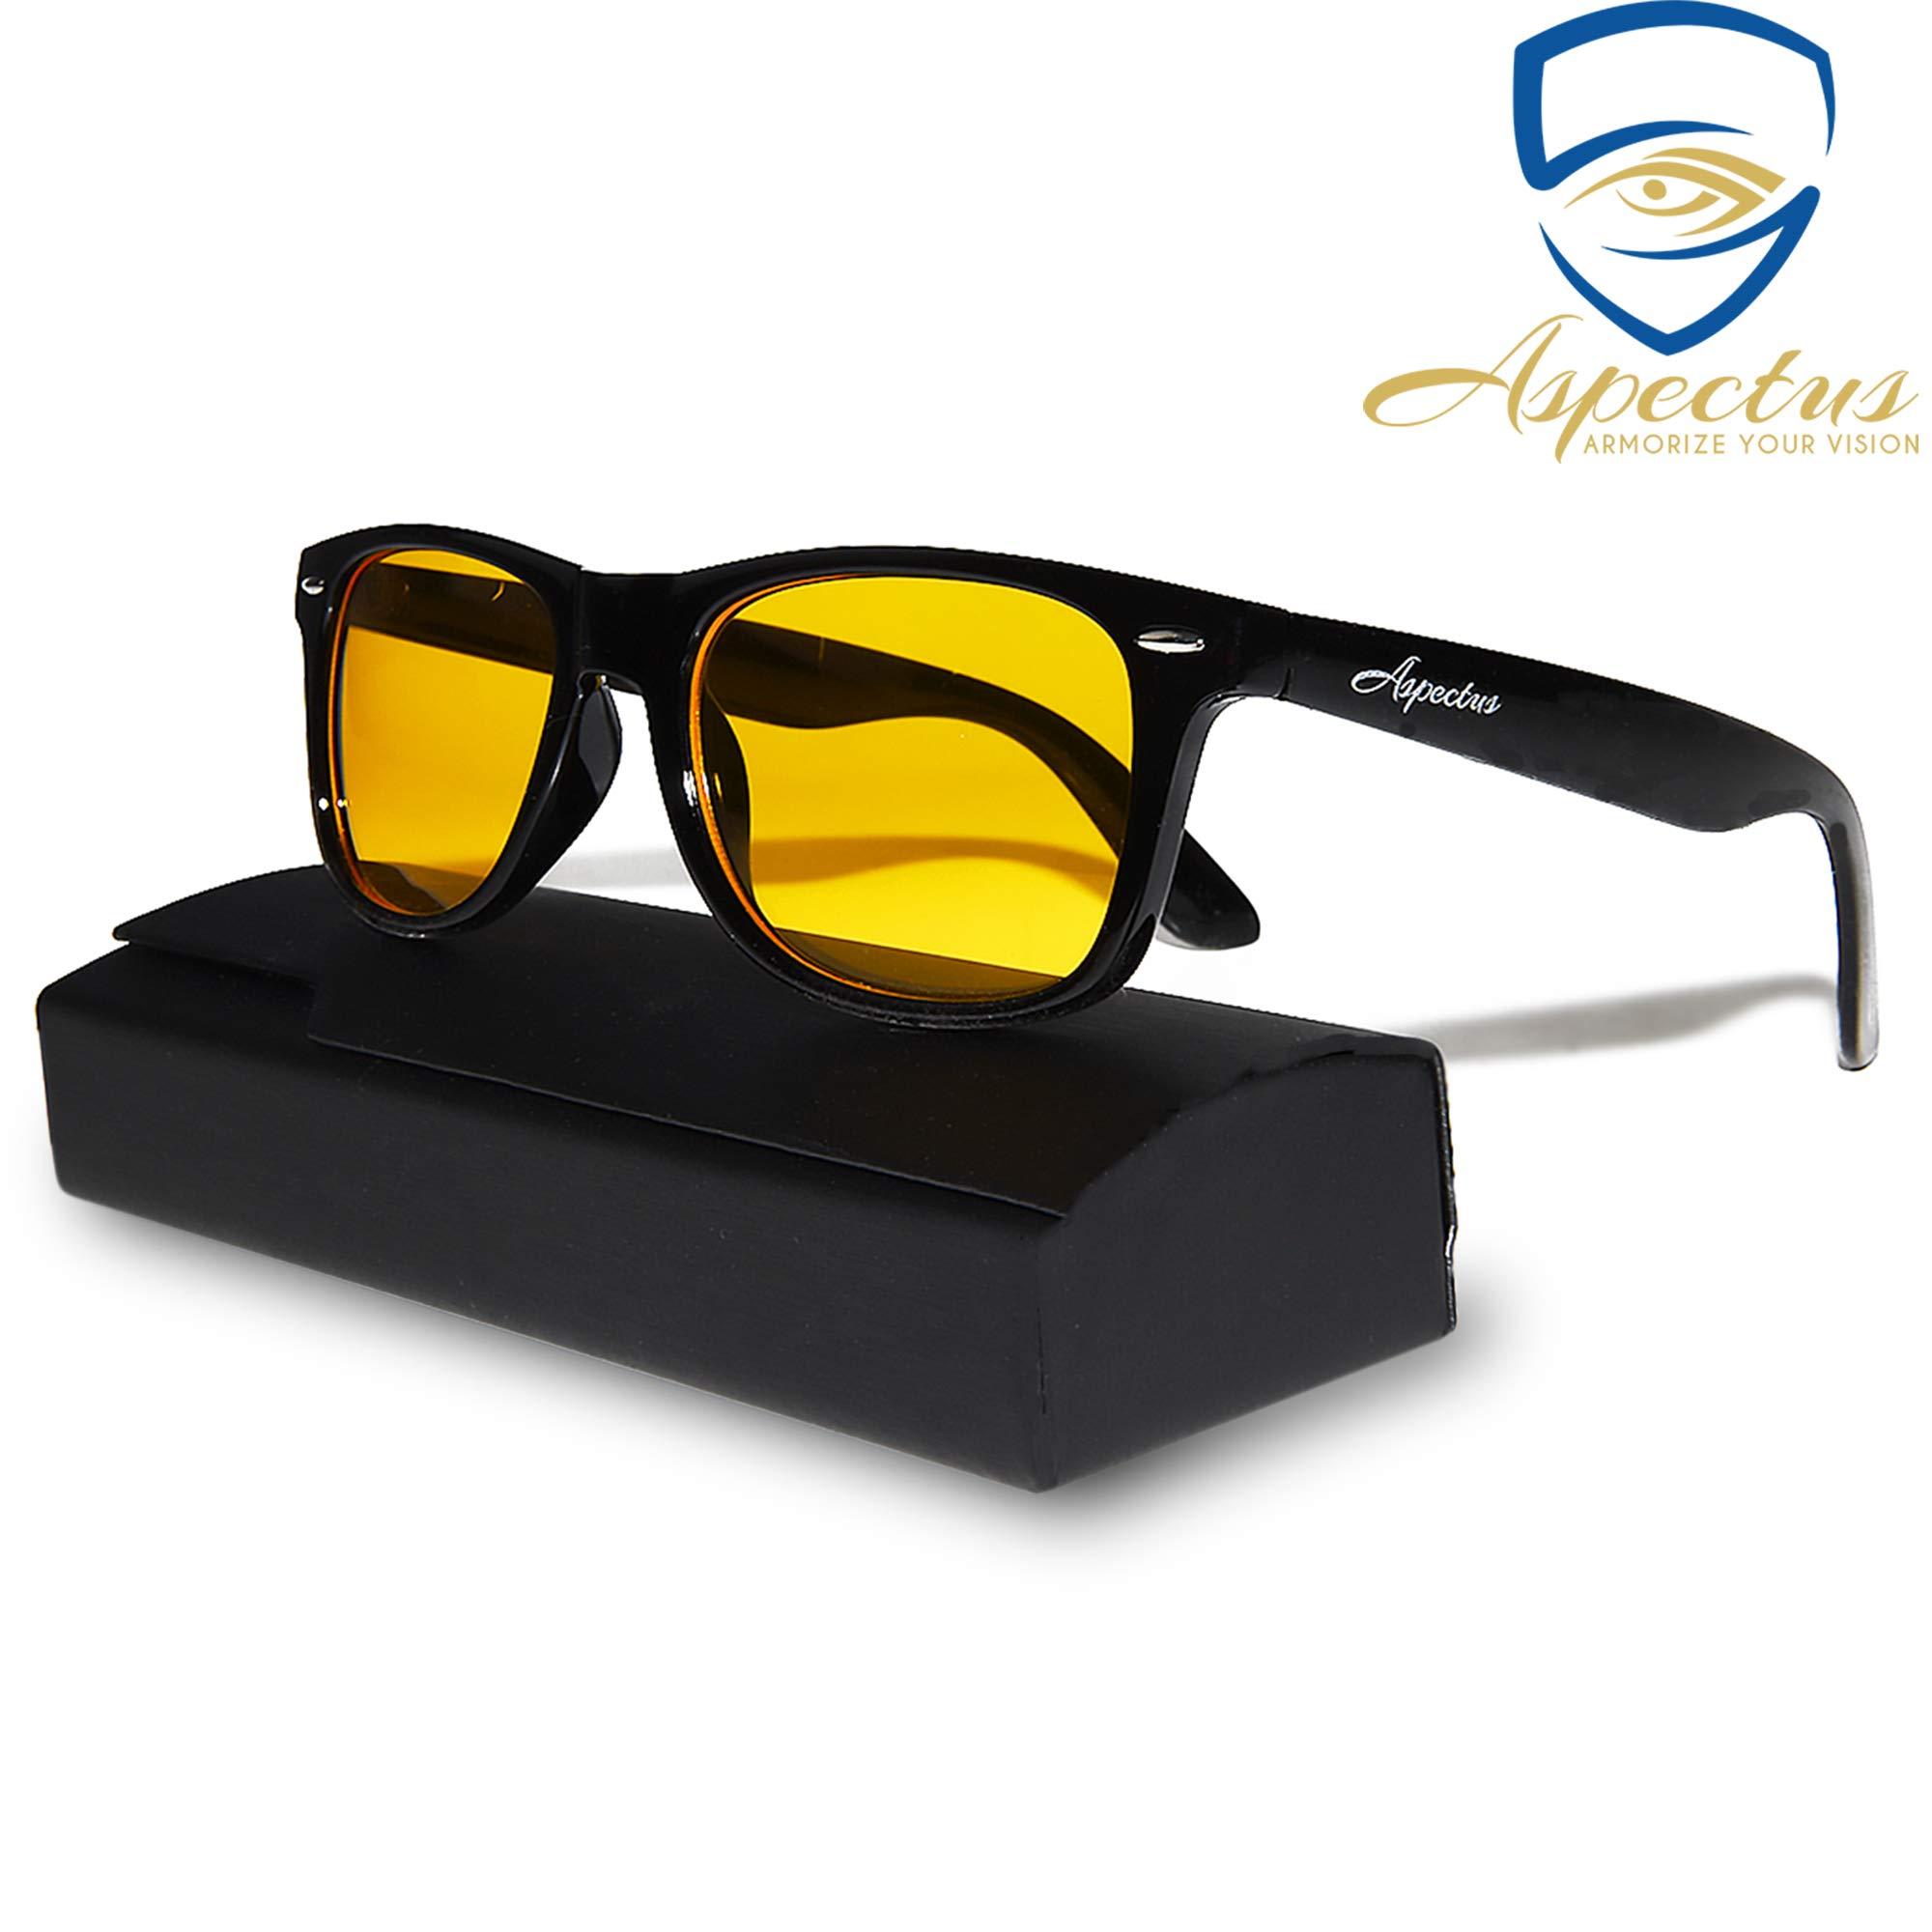 Aspectus Blue Light Blocking Glasses   Premium Gamer & Computer Eyewear   Anti-Blue Light Lenses for Deep Sleep & Relaxation   Eye Strain Relief Anti Glare Glasses   Computer Glasses for Men & Women by Aspectus